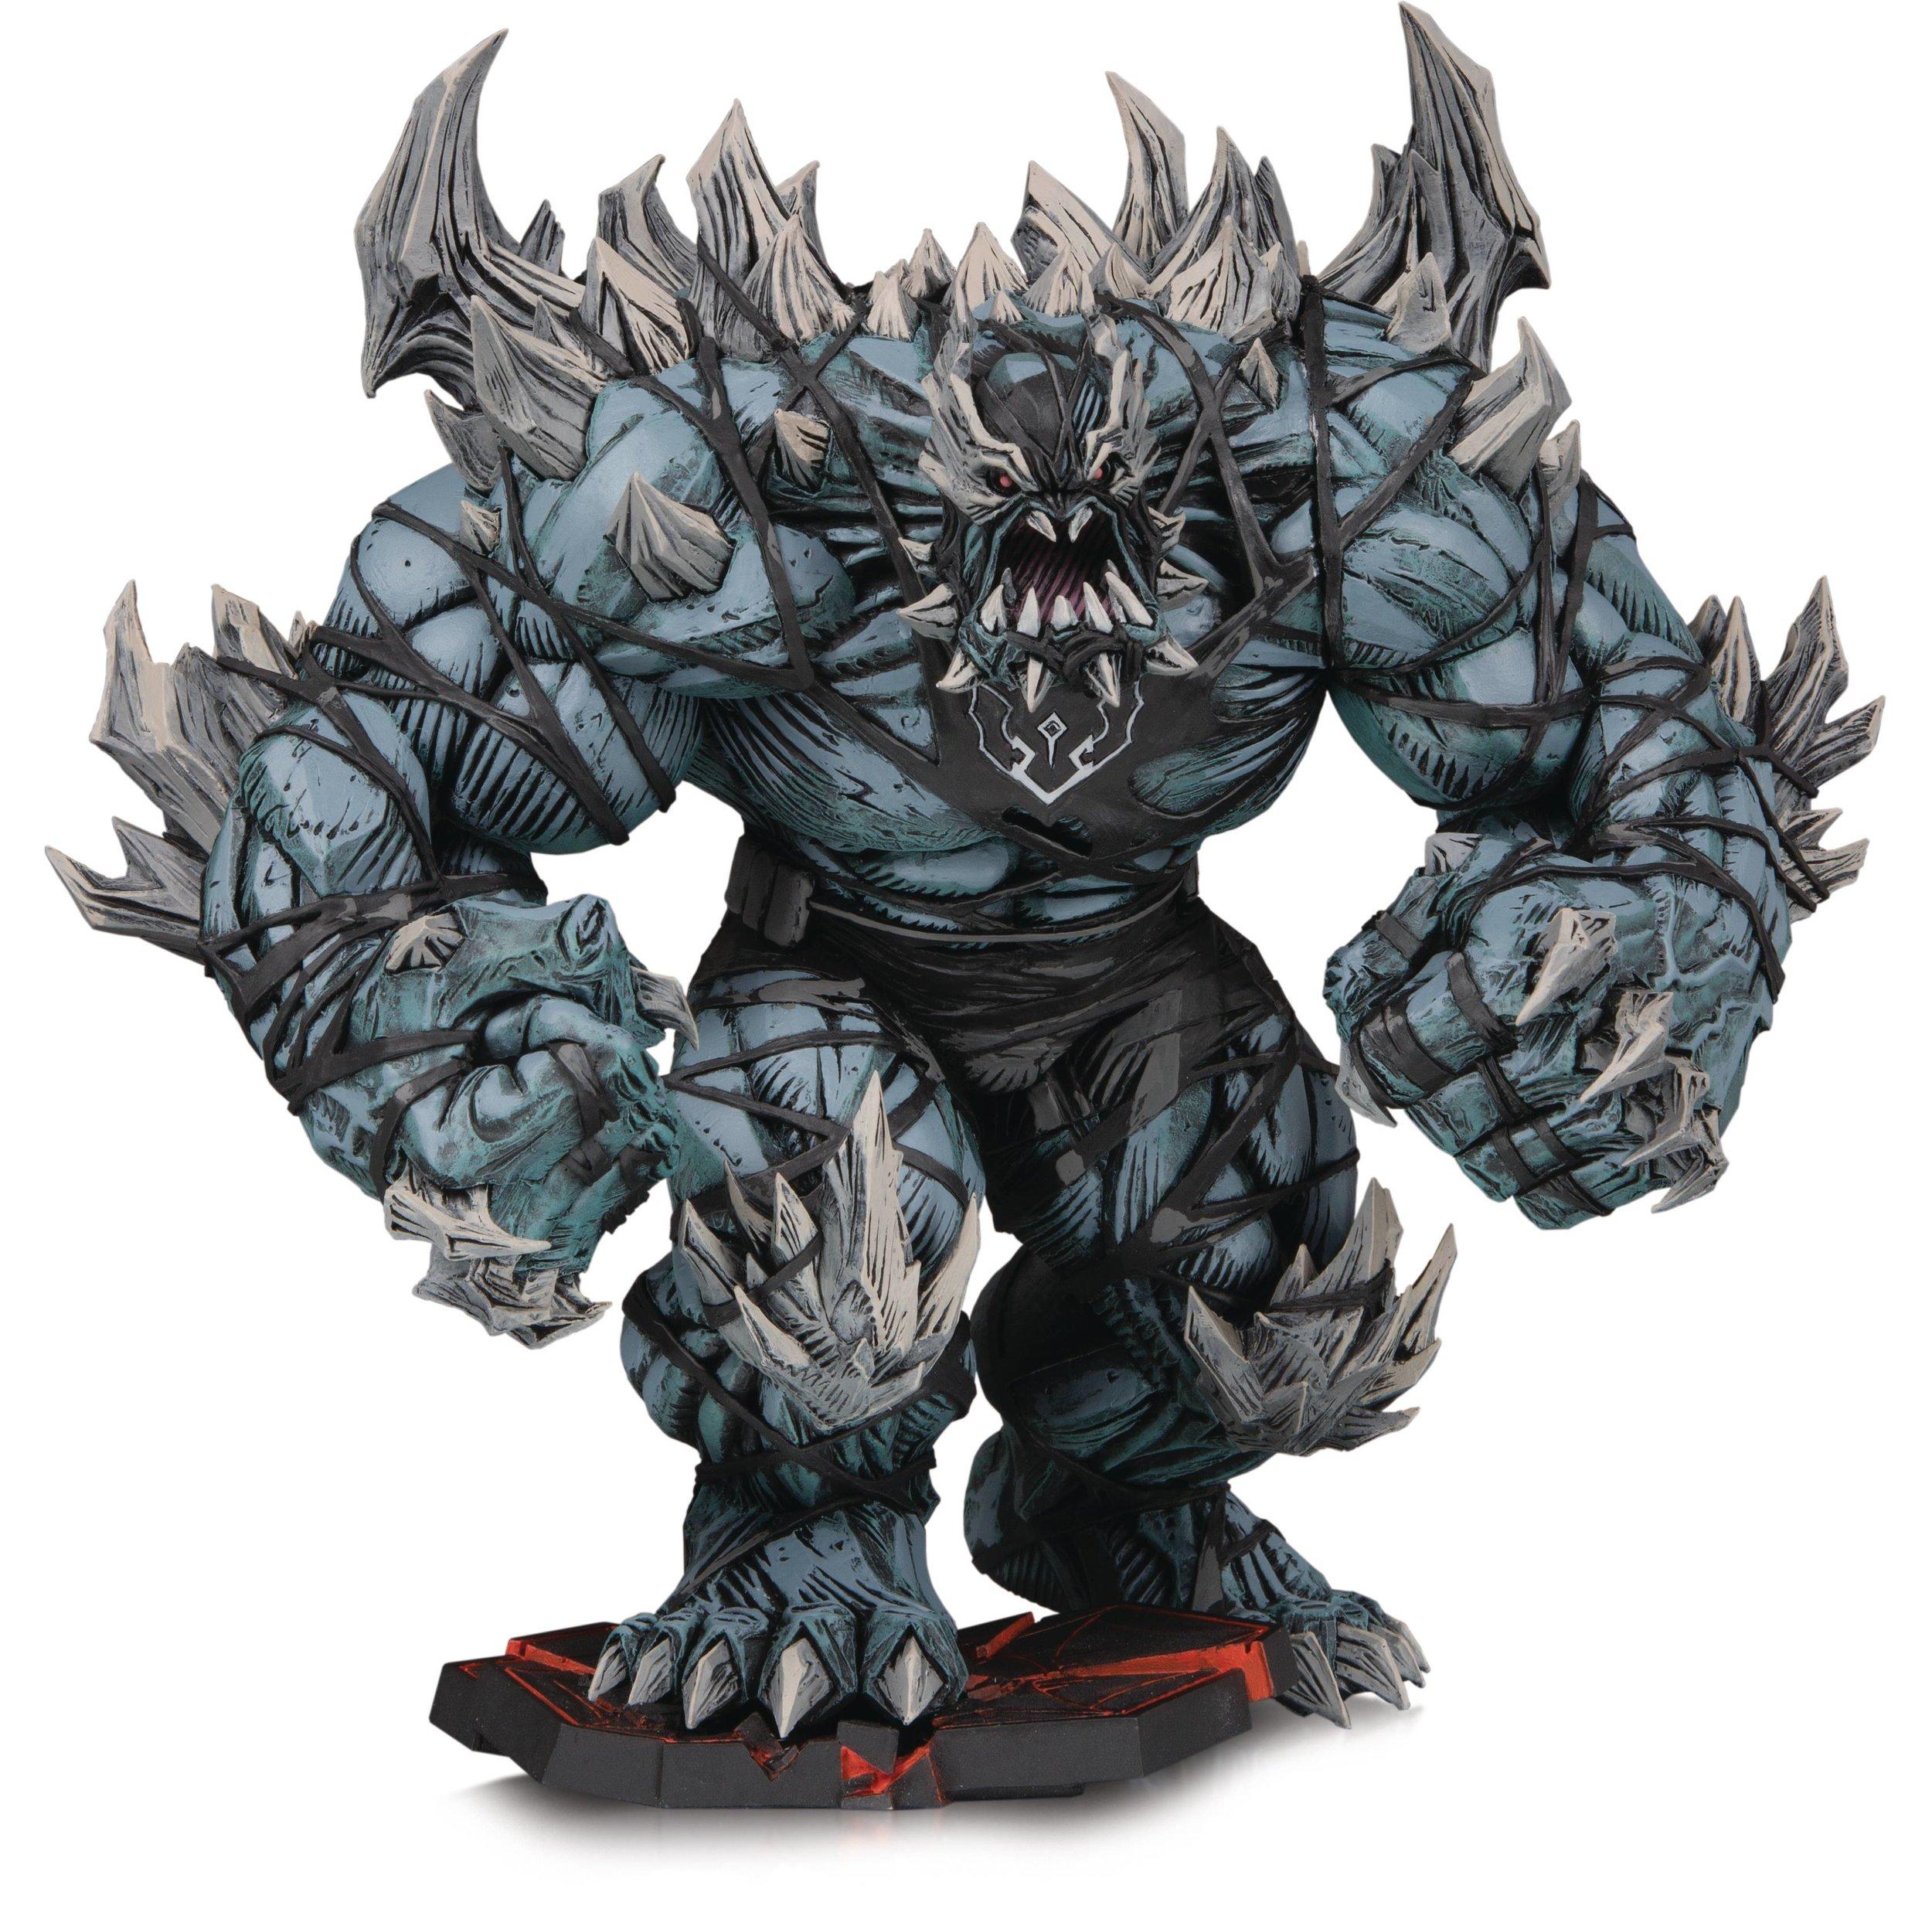 DARK KNIGHTS METAL BATMAN THE DEVASTATOR STATUE